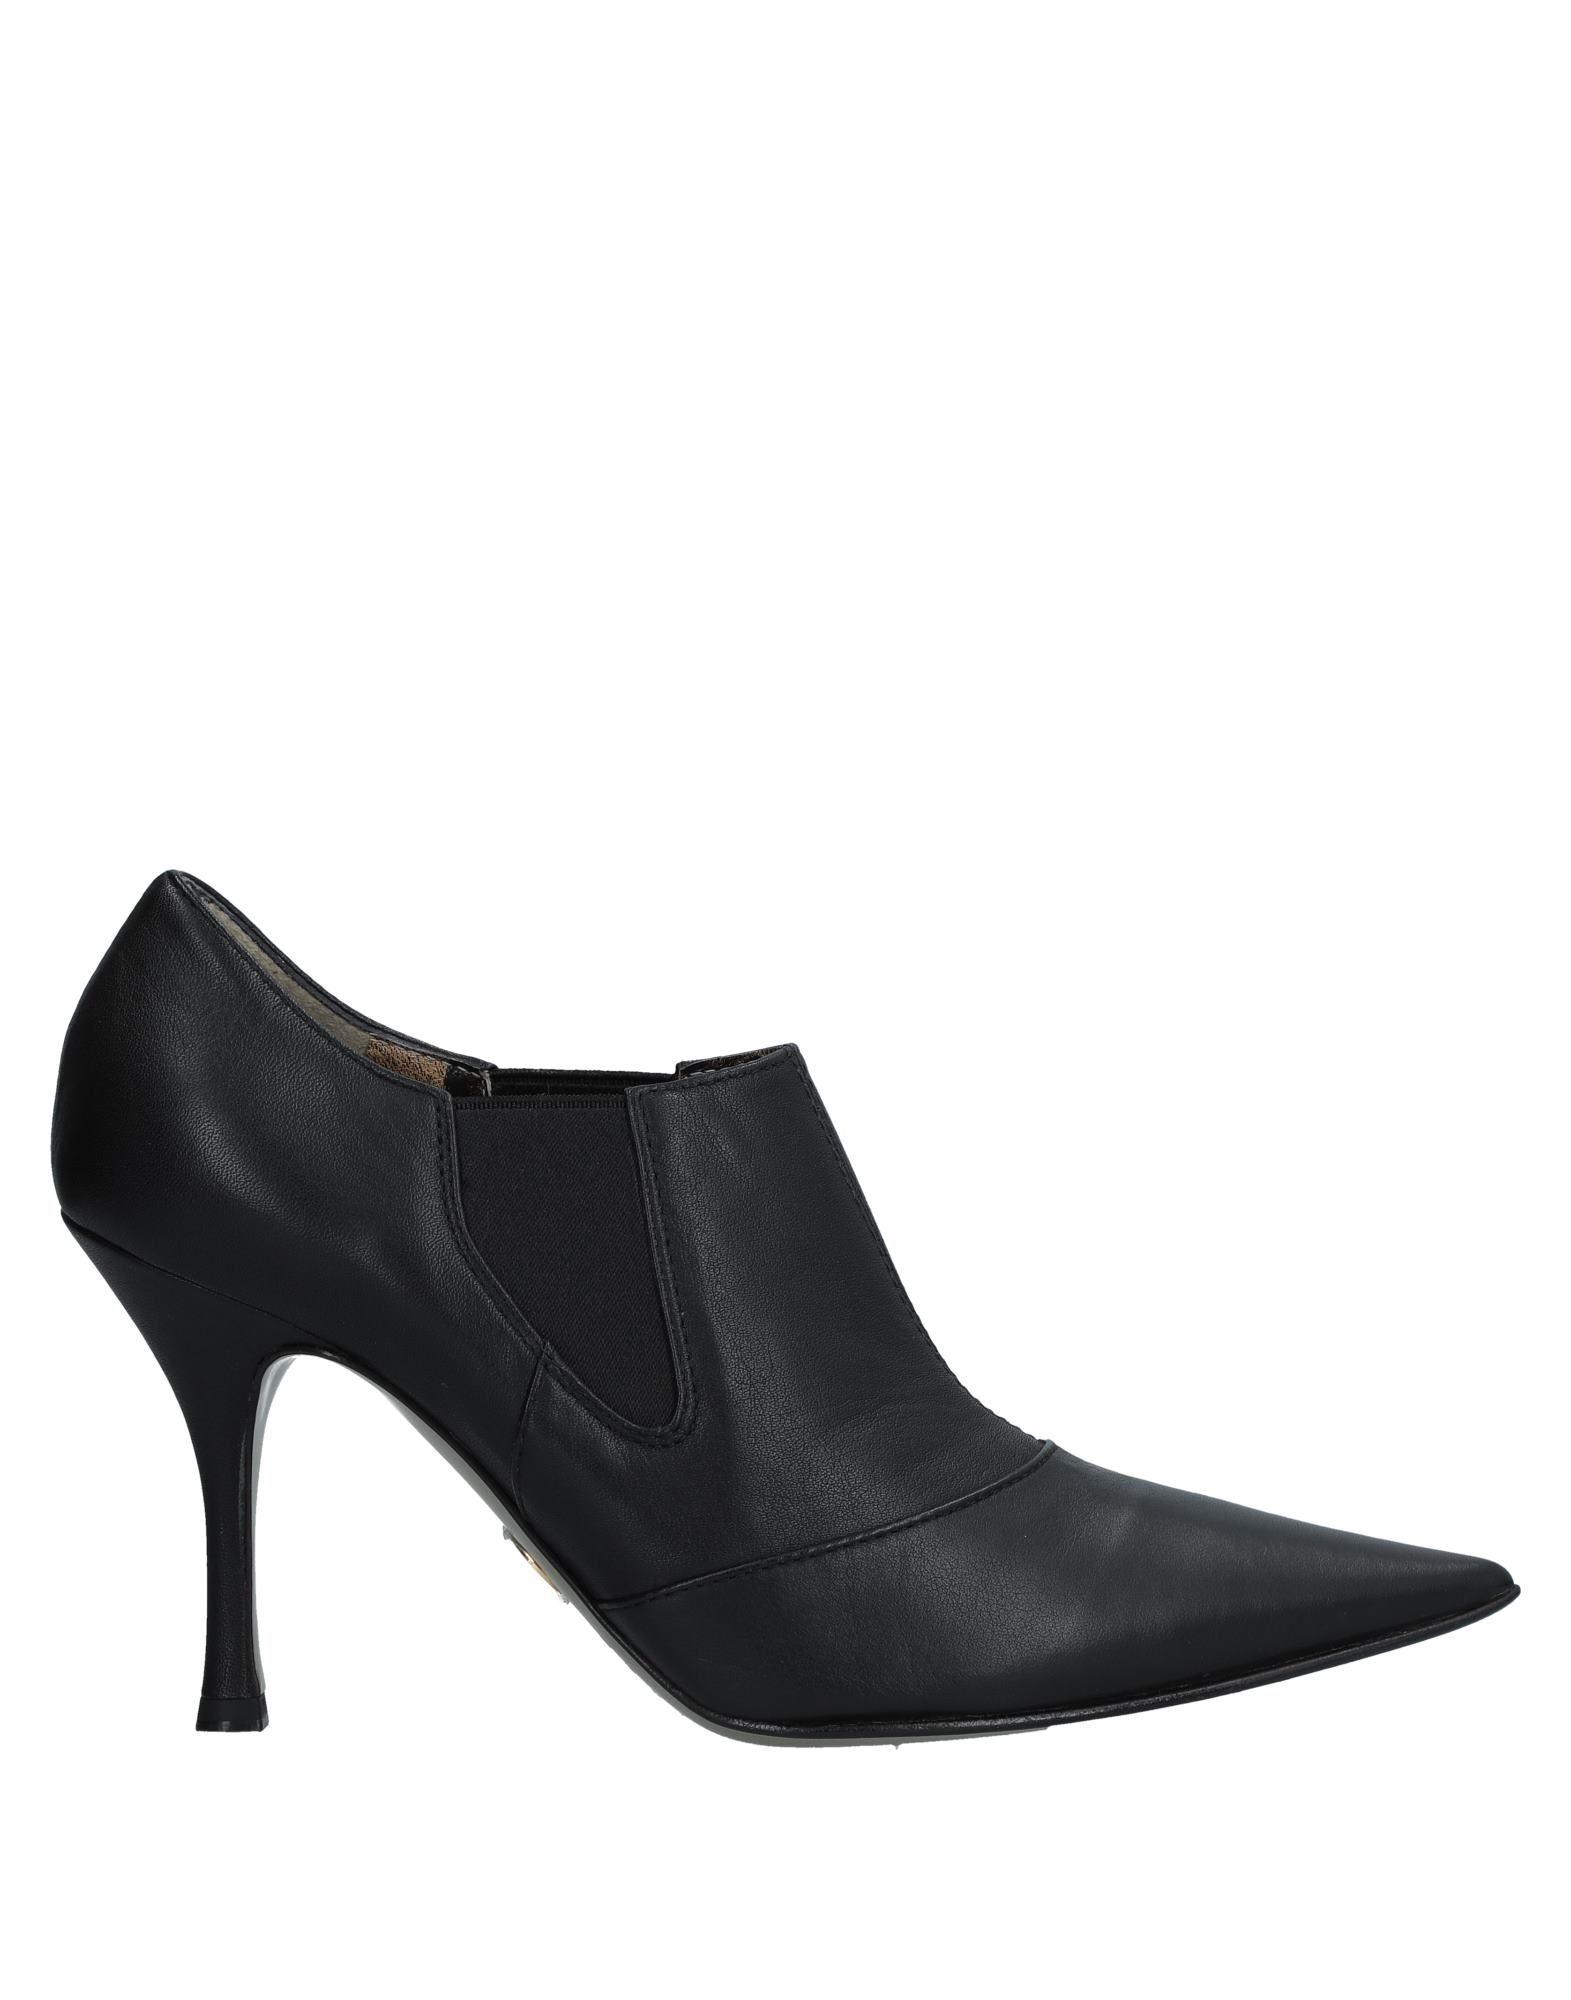 Rabatt Schuhe Dolce & Gabbana Stiefelette Damen  11530409RS